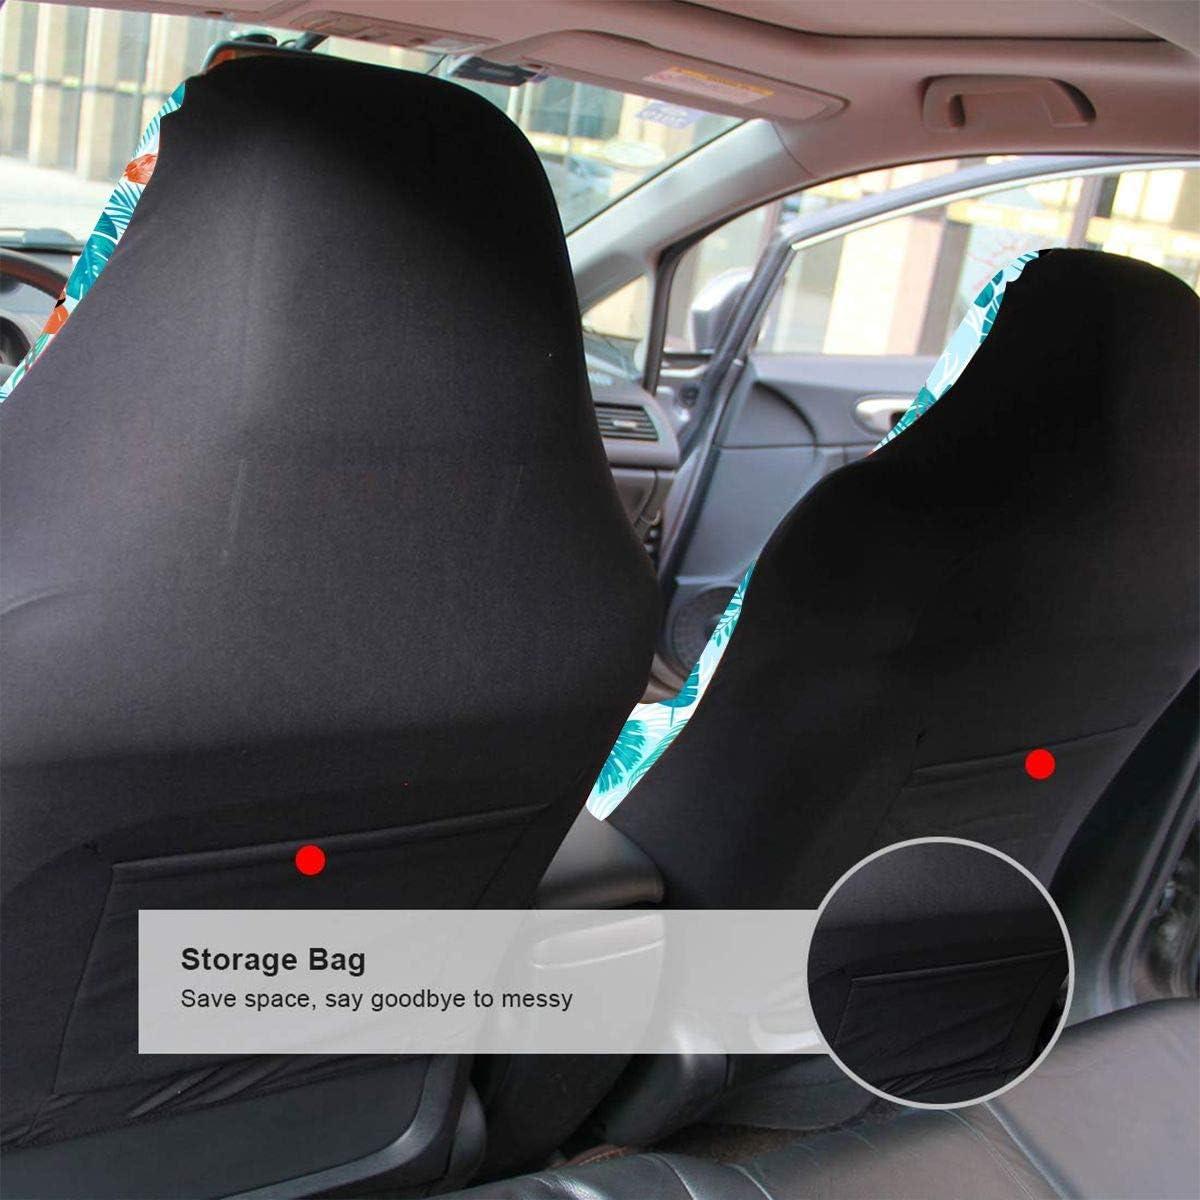 Flamingos Universal Front Seats Vehicle Enterior Protector Suitable Fits Most Car Auto SUV Sedan Truck 2 PCS Delerain Car Seat Covers